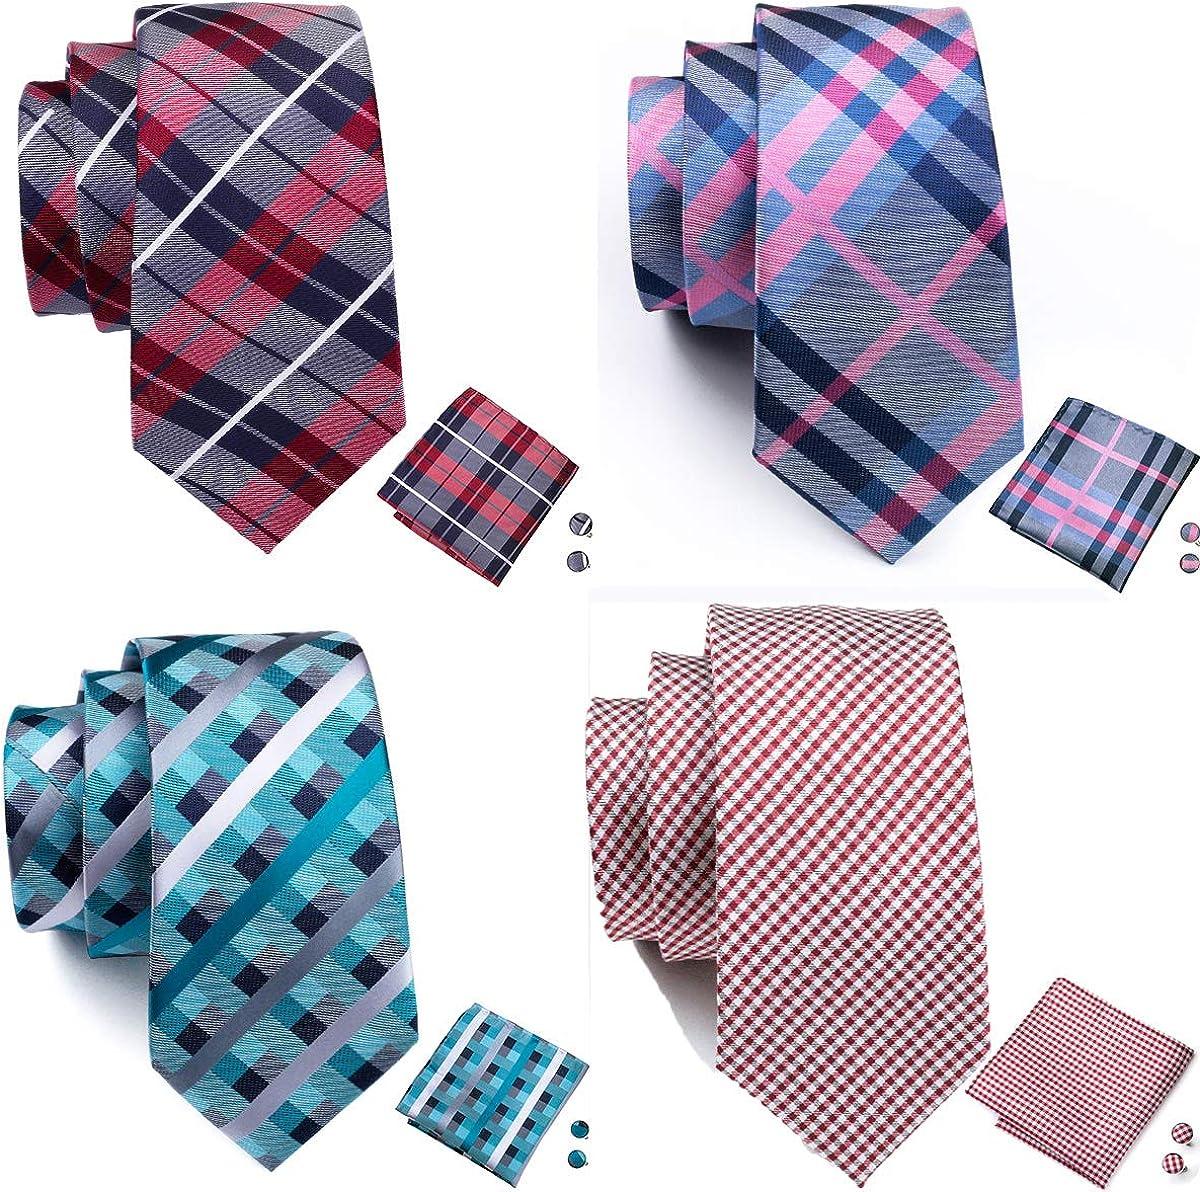 Barry.Wang Men's Ties Set Silk Wedding Neckties Woven Silk Formal Business Casual(4/6/8PCS)